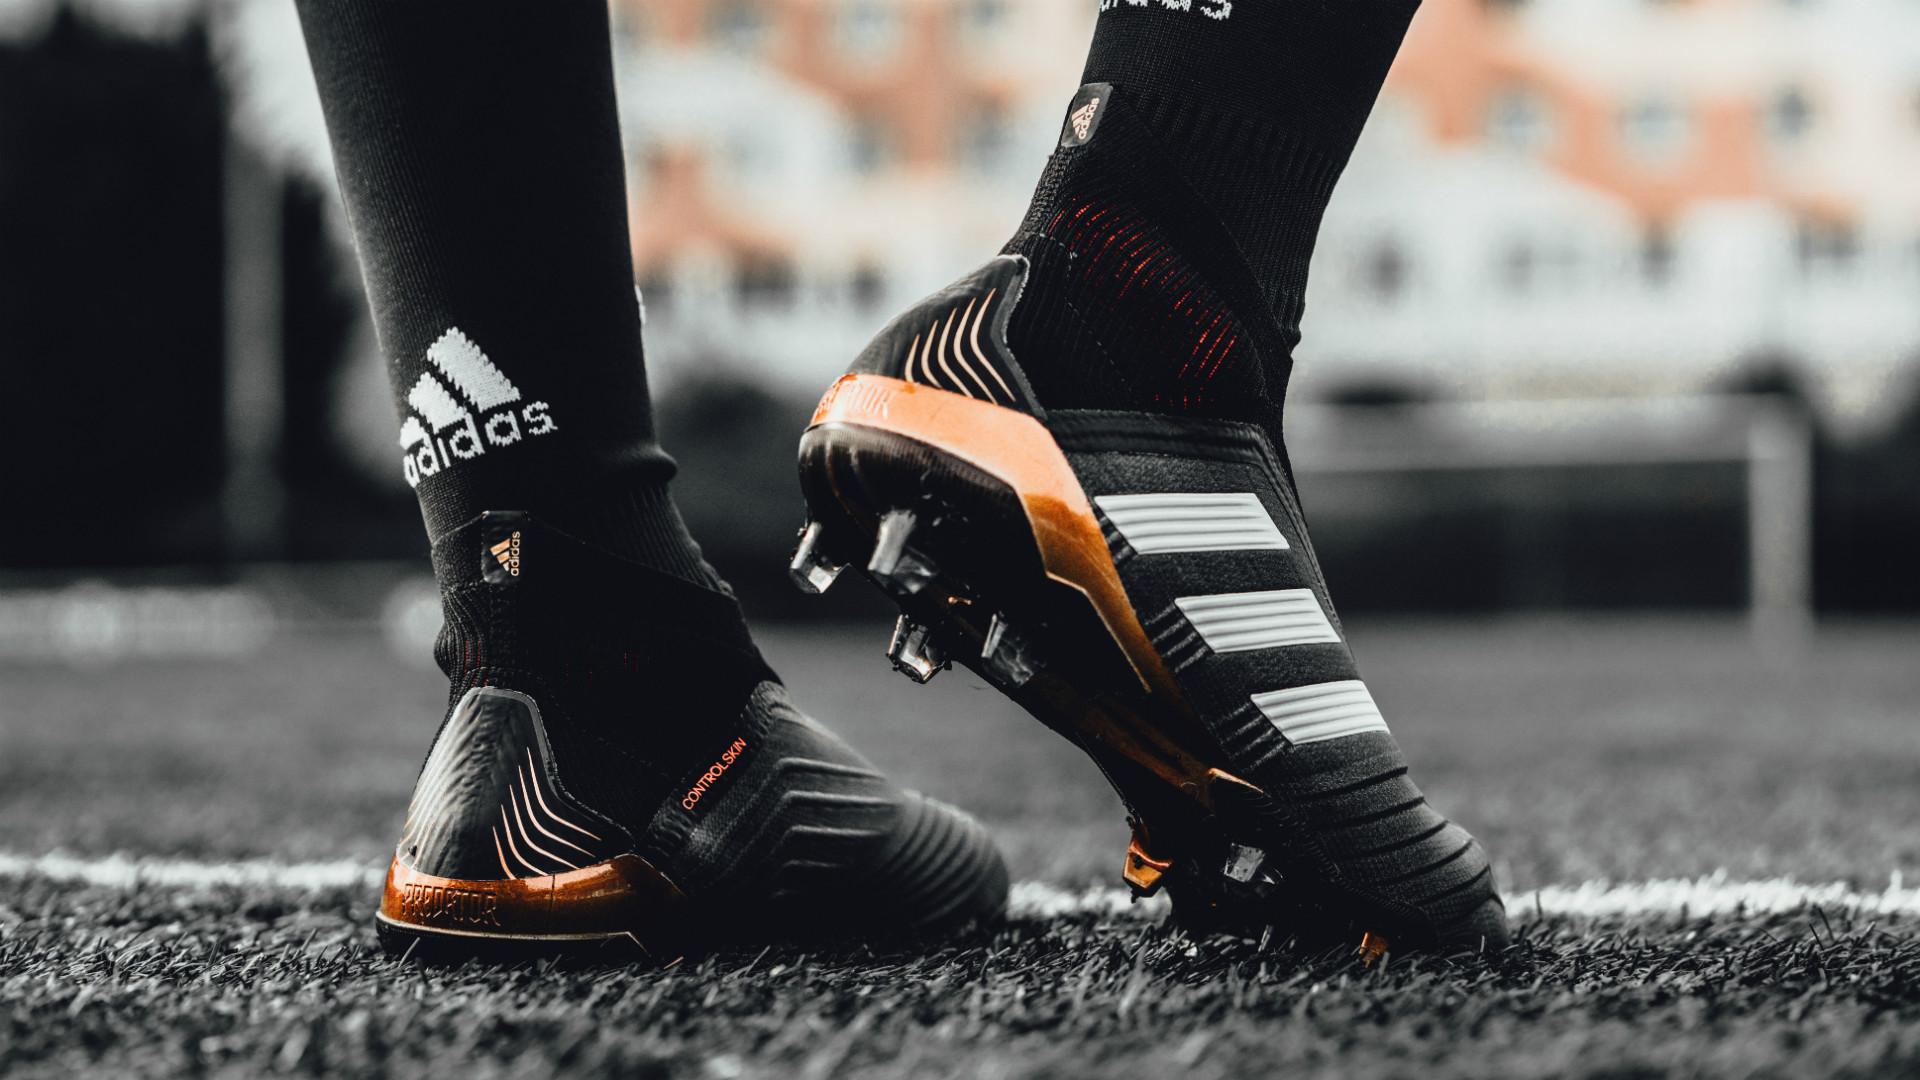 Adidas-predator-18_inrzxyupsor512sen7h0ckwkl